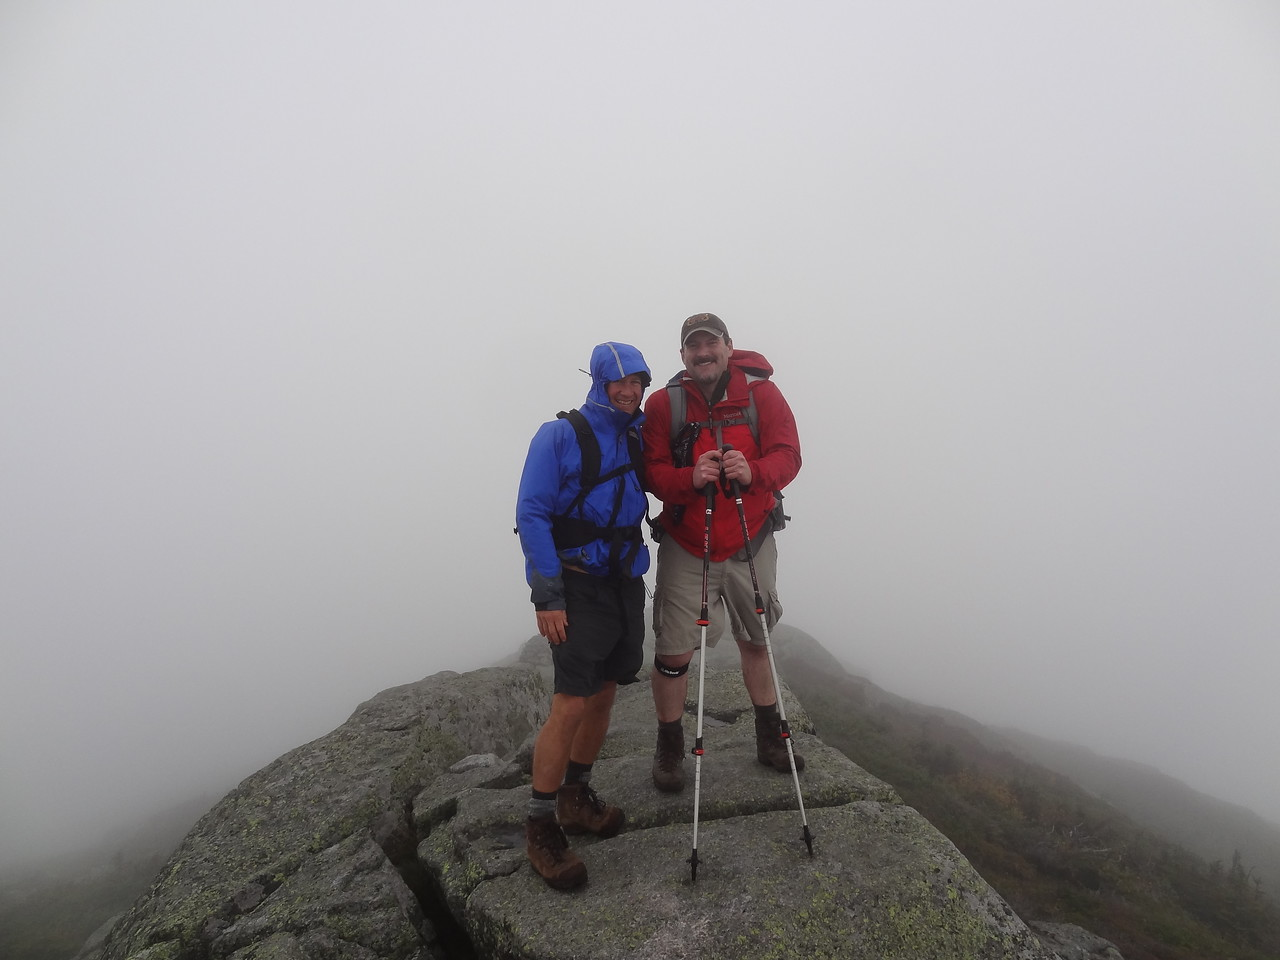 On the ridge summit of Haystack. Hace Frio.